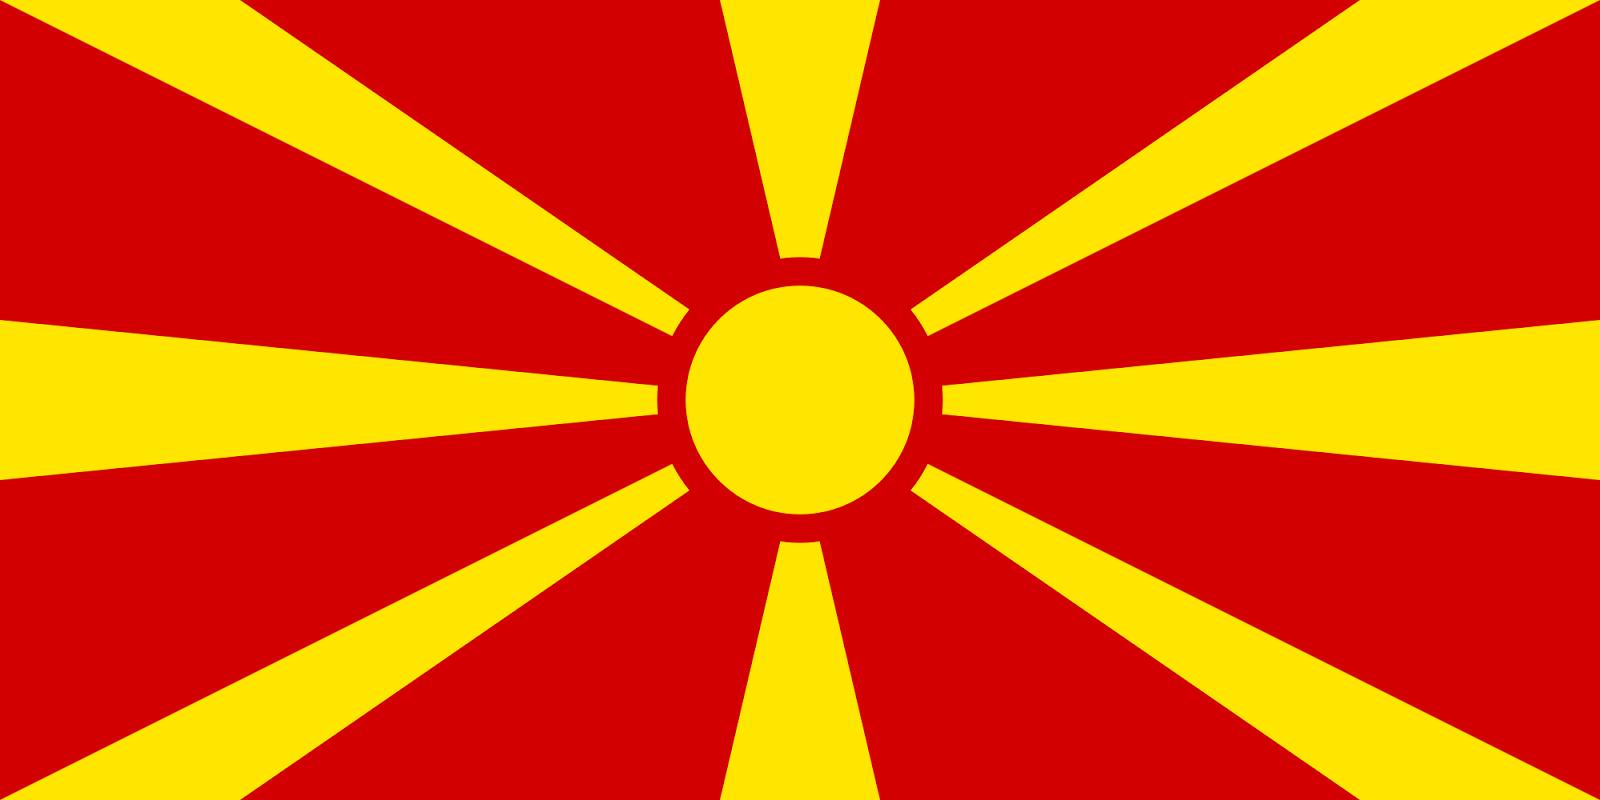 http://carbrandsincurrentproduction.blogspot.com.es/search/label/Macedonia